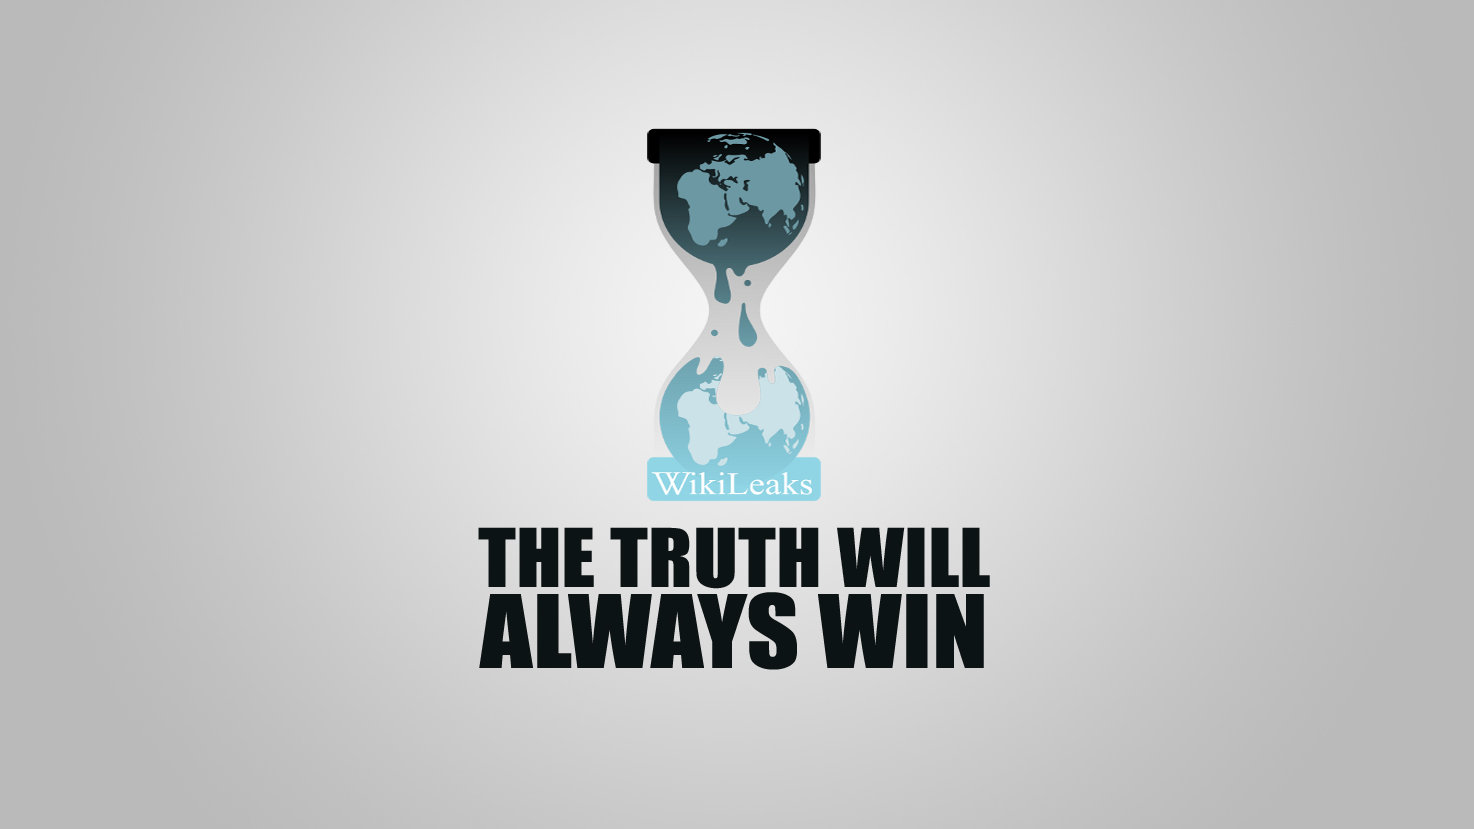 http://4.bp.blogspot.com/_4zQcDoWmD0s/TQtyQQLRaOI/AAAAAAAAAQs/5rEAs2UvA5A/s1600/Wikileaks.png